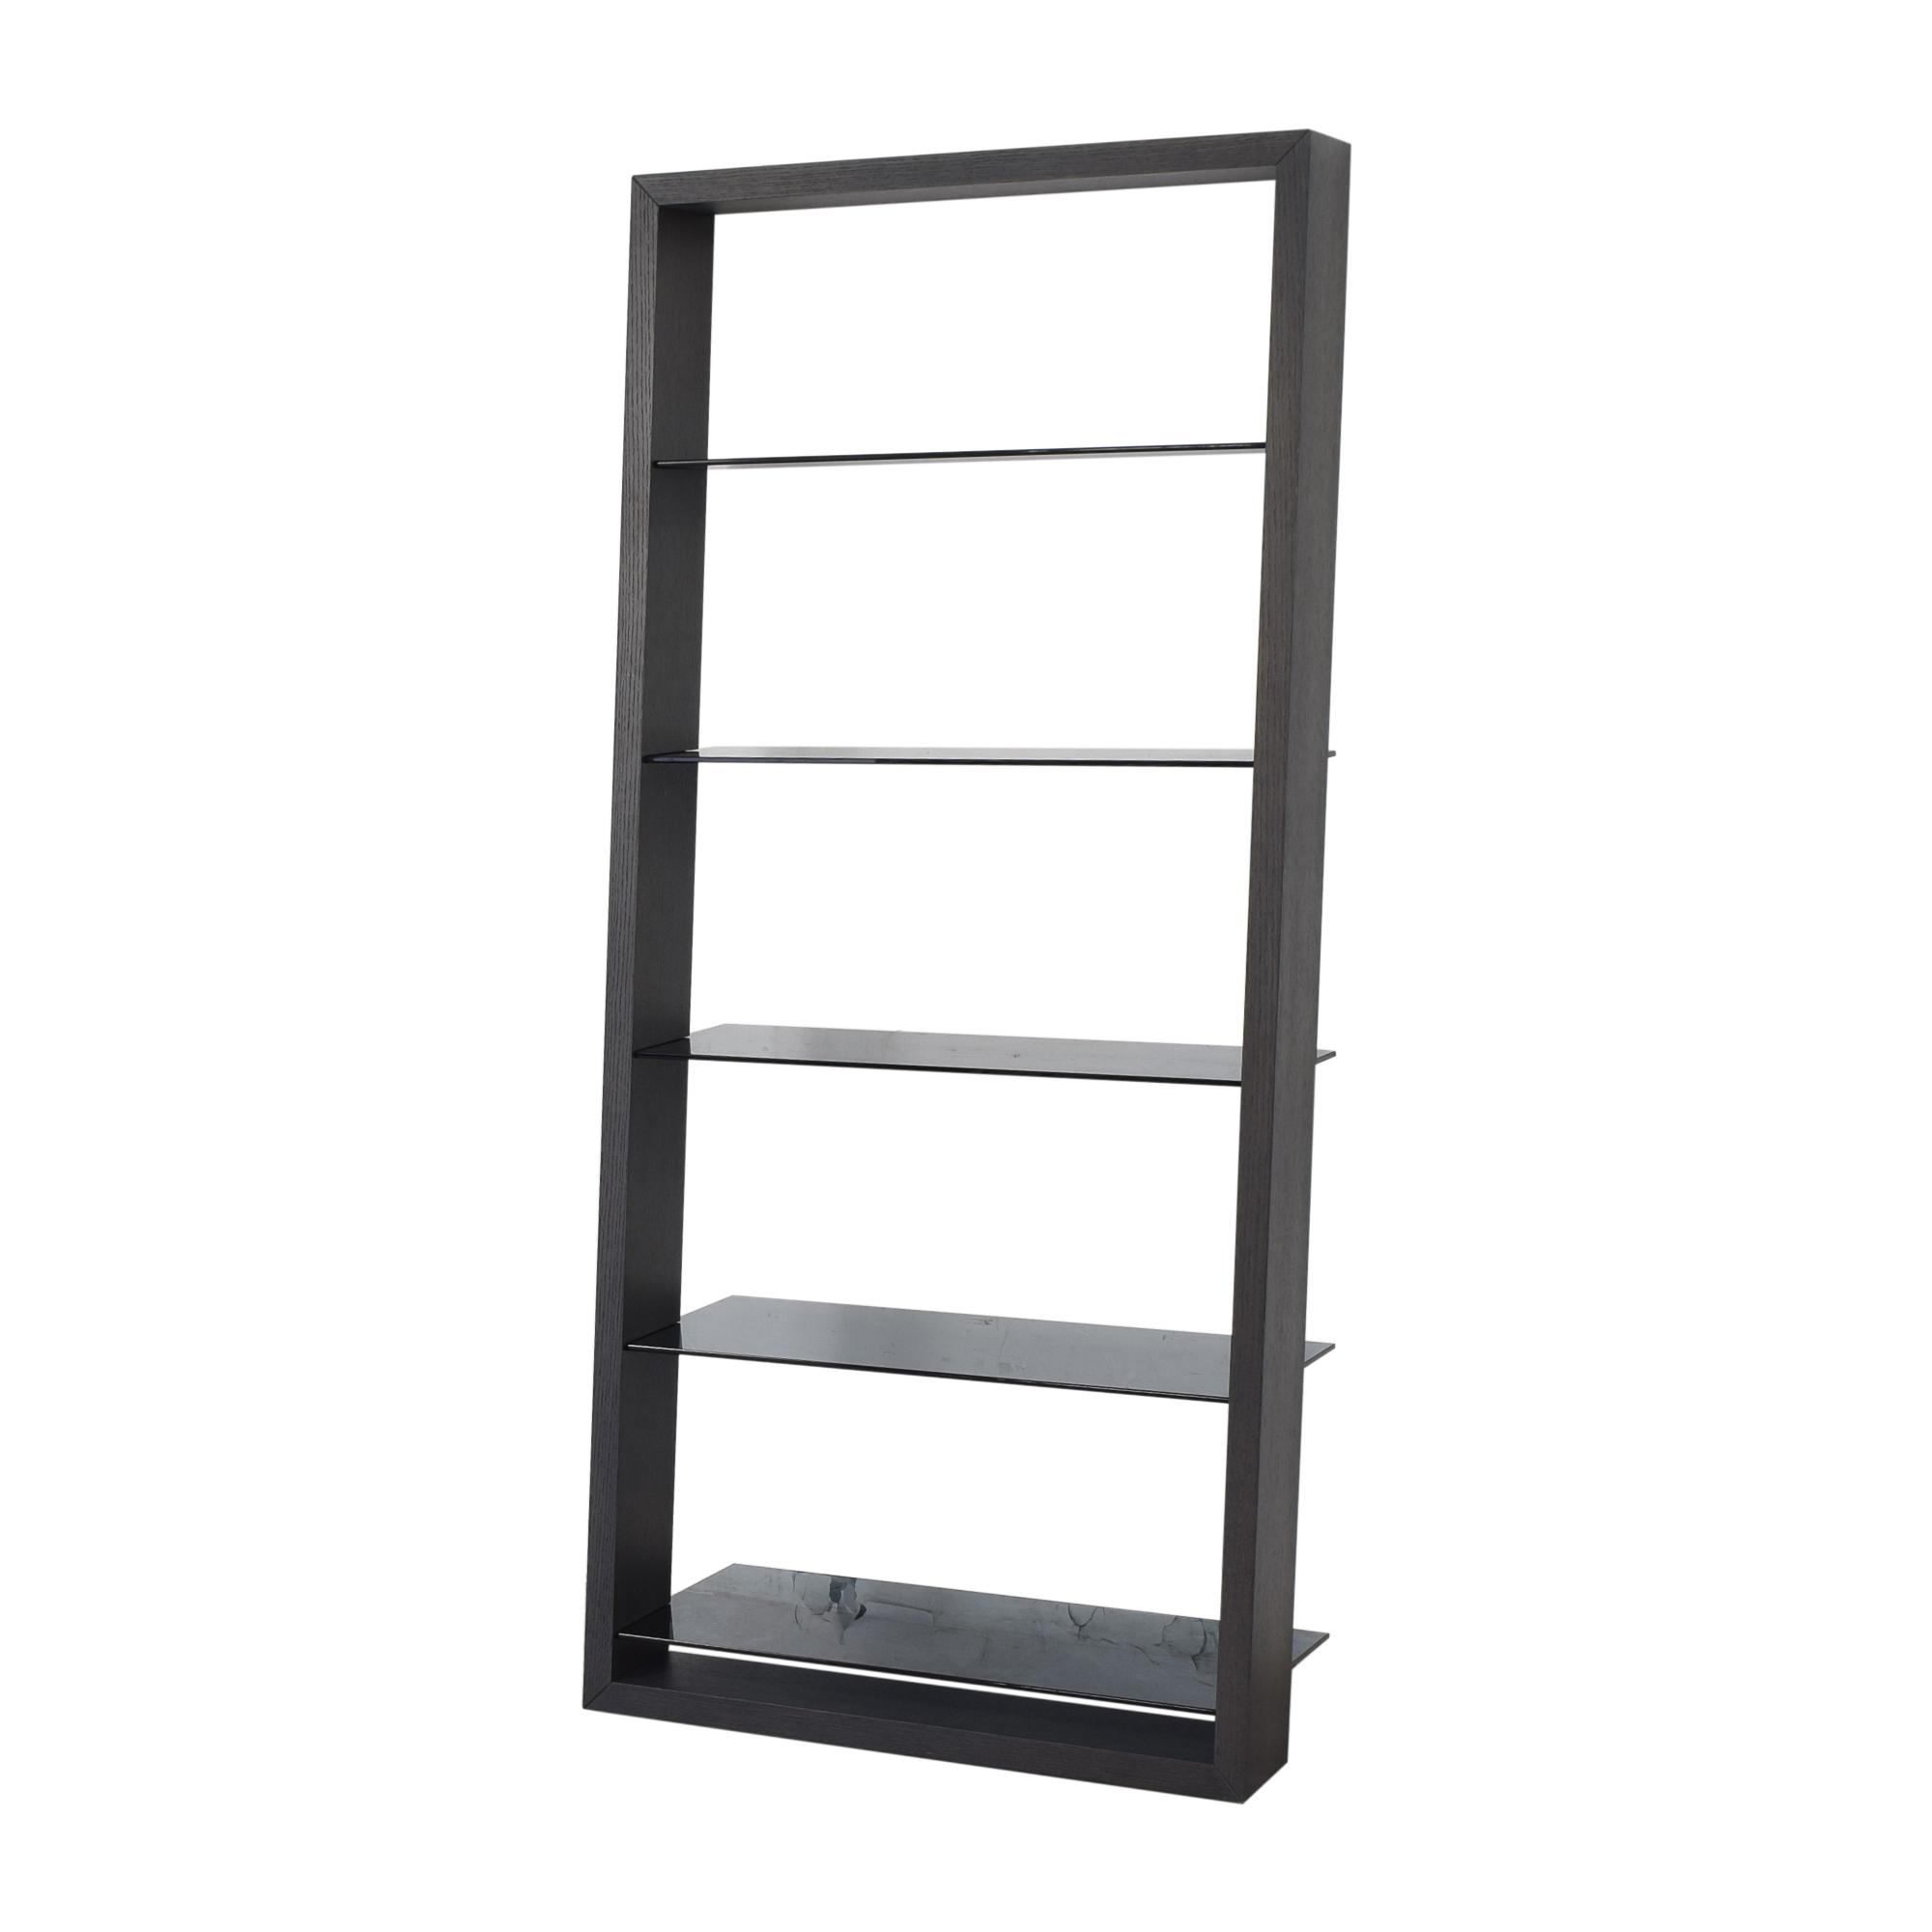 BDI Furniture Jensen-Lewis BDI Eileen Leaning Shelf Storage